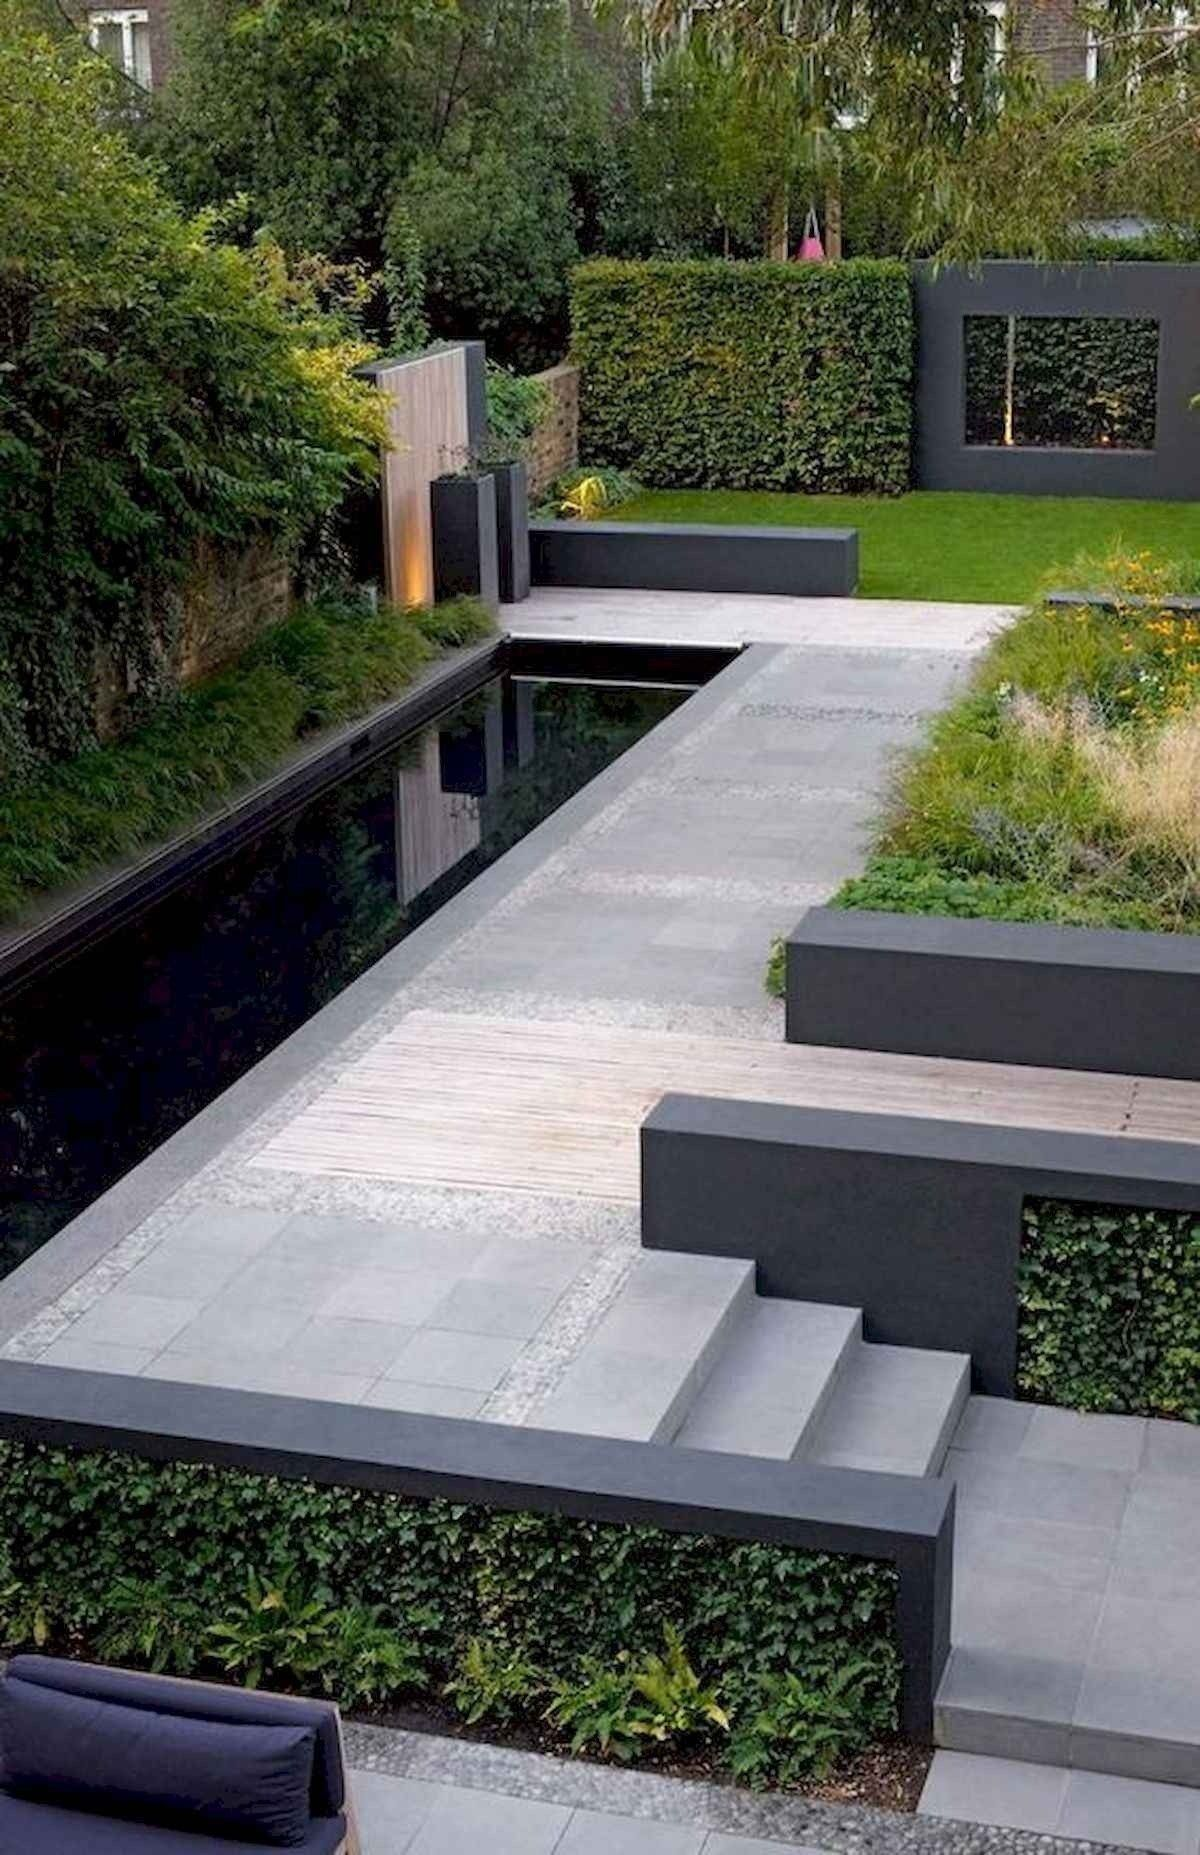 60 Beautiful Backyard Garden Design Ideas And Remodel Desain Kebun Modern Pertamanan Belakang Rumah Halaman Belakang Modern Modern outdoor garden ideas